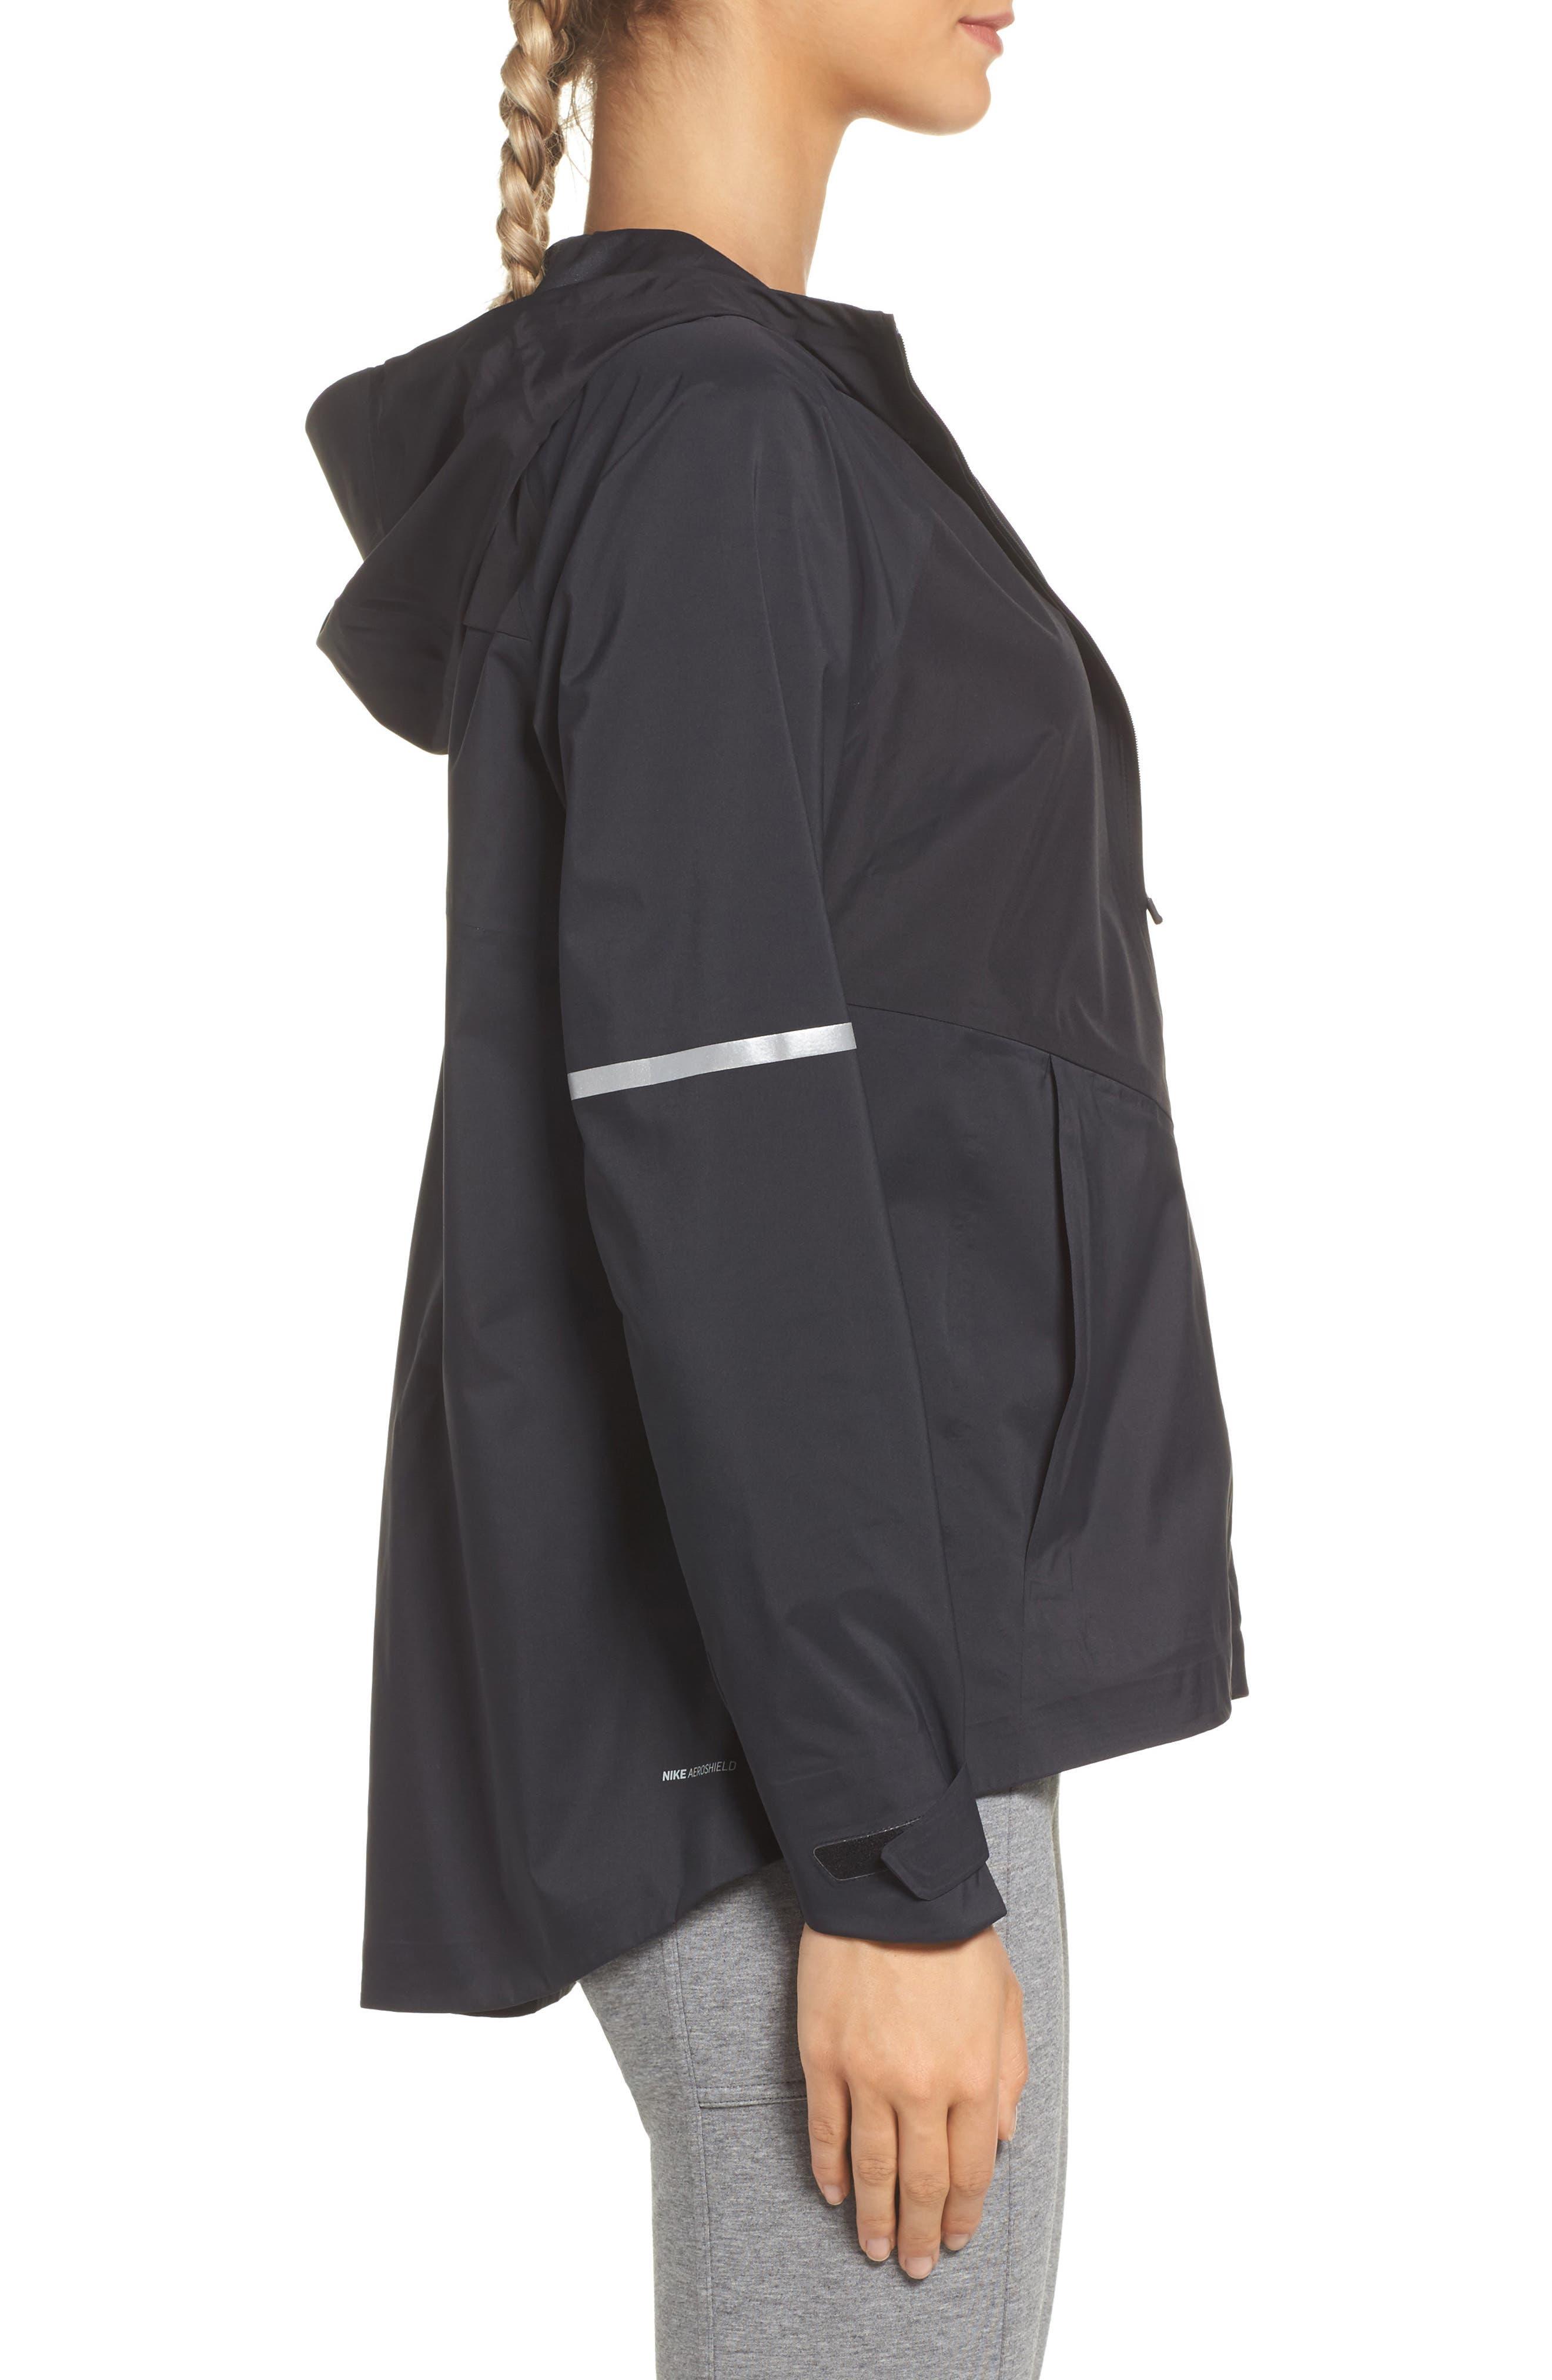 Zonal AeroShield Hooded Running Jacket,                             Alternate thumbnail 3, color,                             010